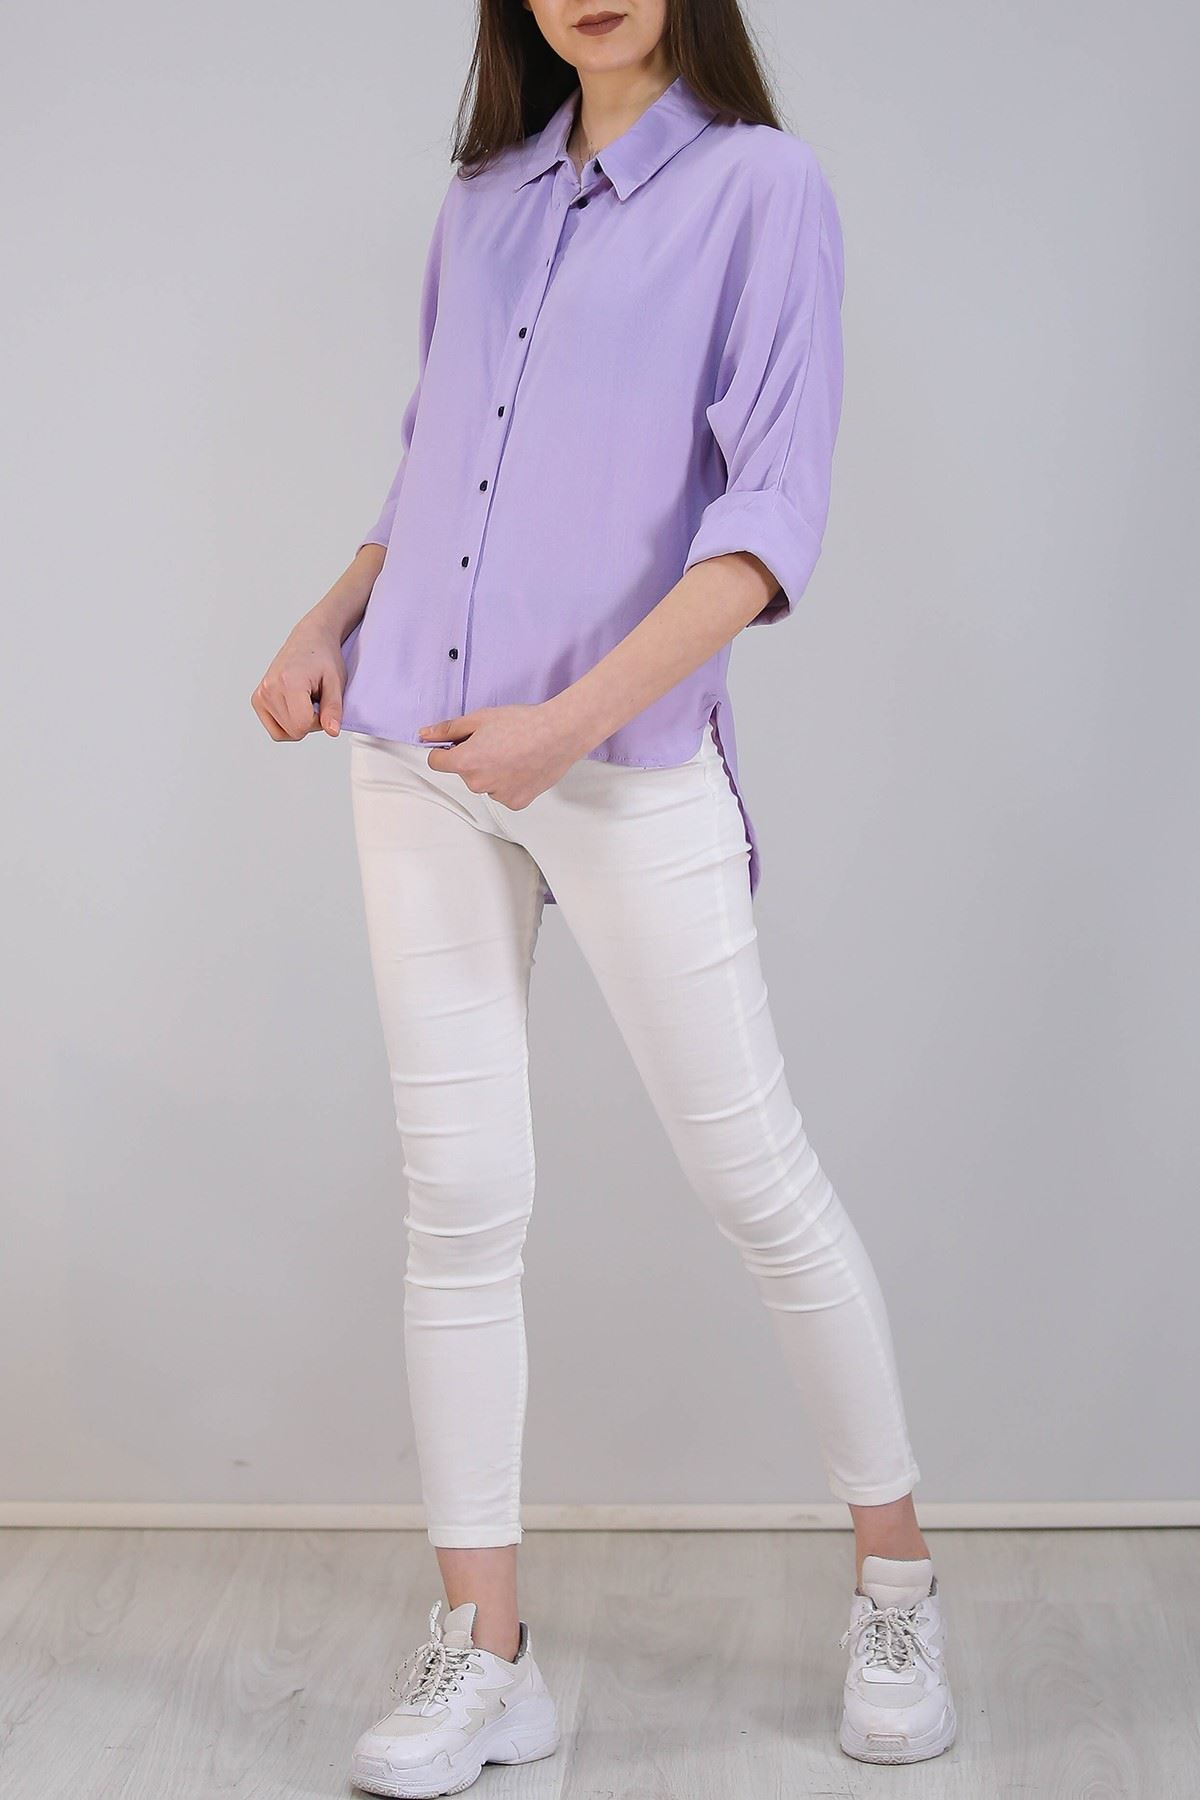 Salaş Kesim Kadın Gömlek Lila - 3339.222.